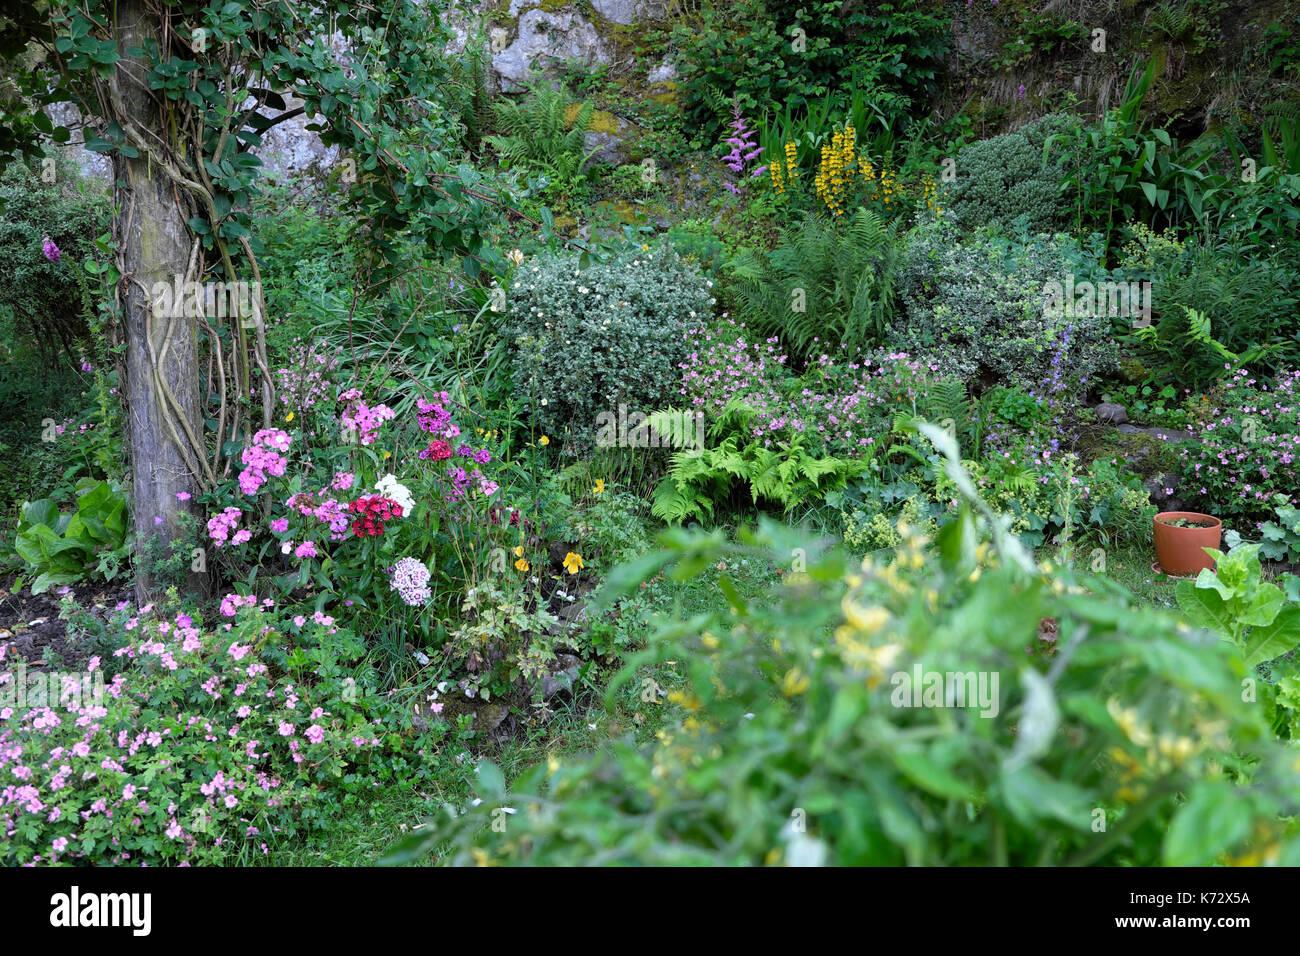 Perennial rockery garden in bloom with sweet williams, honeysuckle climbing rose, pink geranium in border July in rural Wales UK   KATHY DEWITT - Stock Image